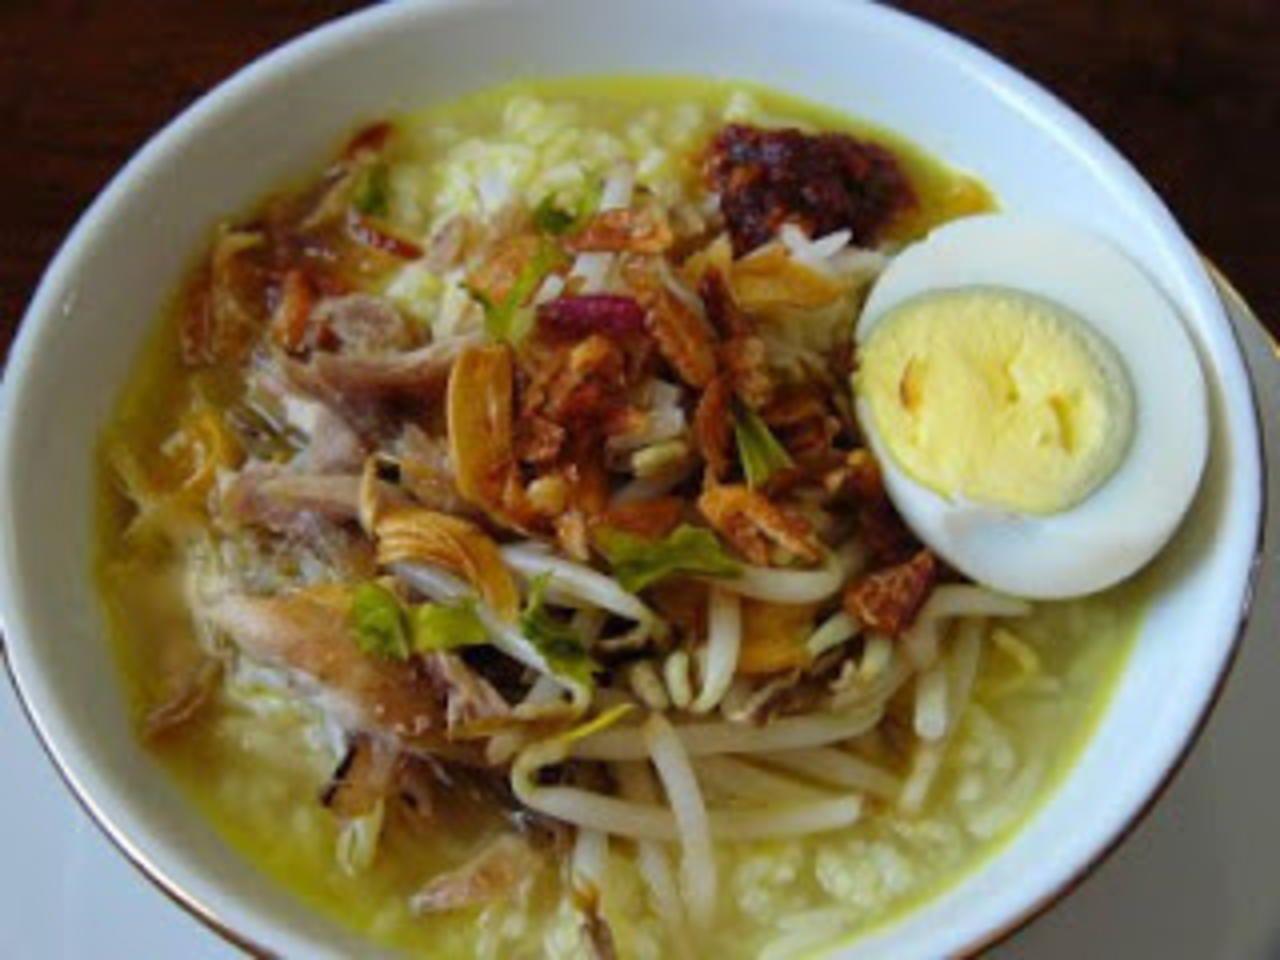 Resep Soto Lamongan Daging Ayam Sederhana Oleh Resepjuna Blogspot Com C Resep Resep Resep Masakan Resep Masakan Indonesia